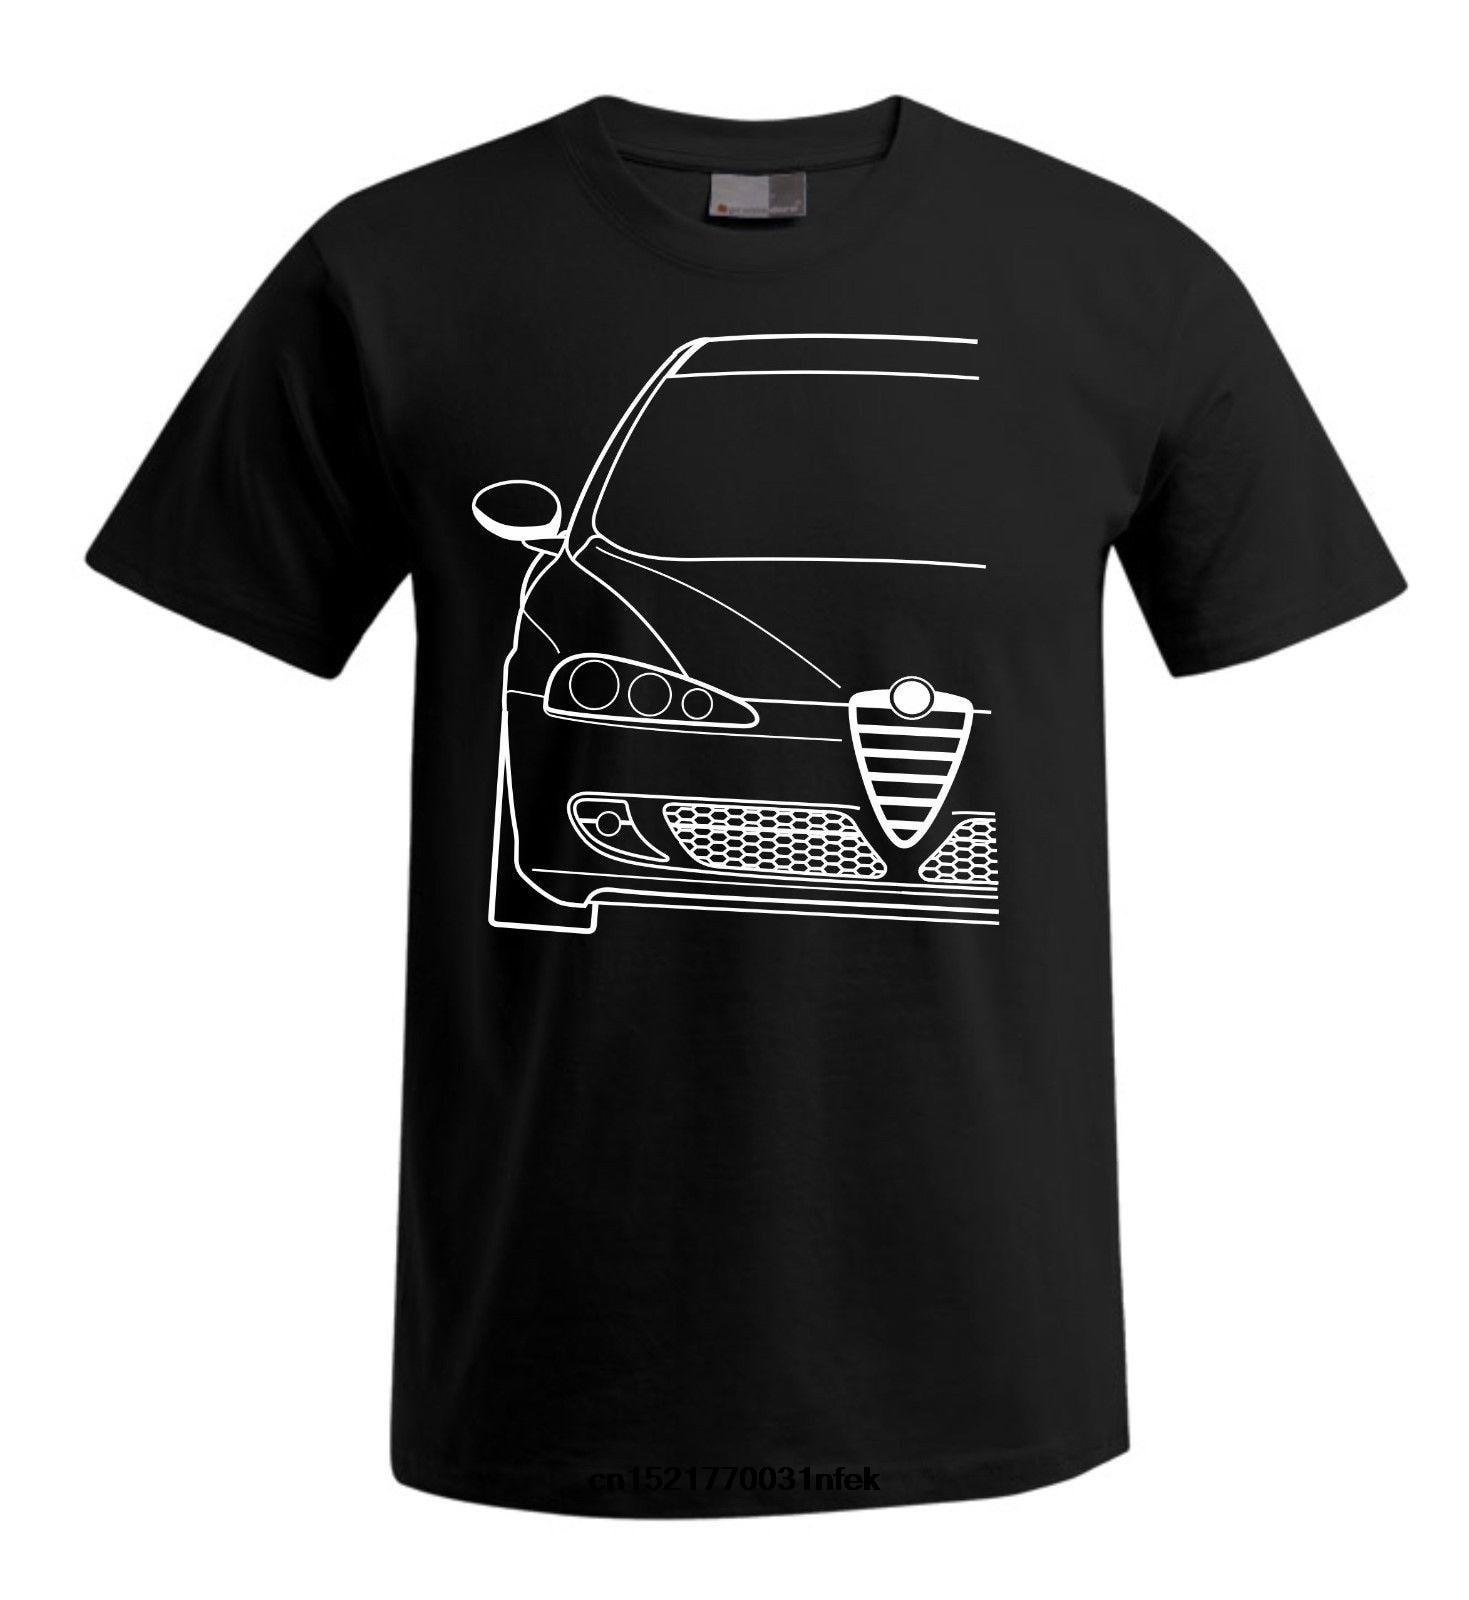 Men T shirt Alfa Romeo 147 s Casual Cotton Loose funny t-shirt novelty tshirt women